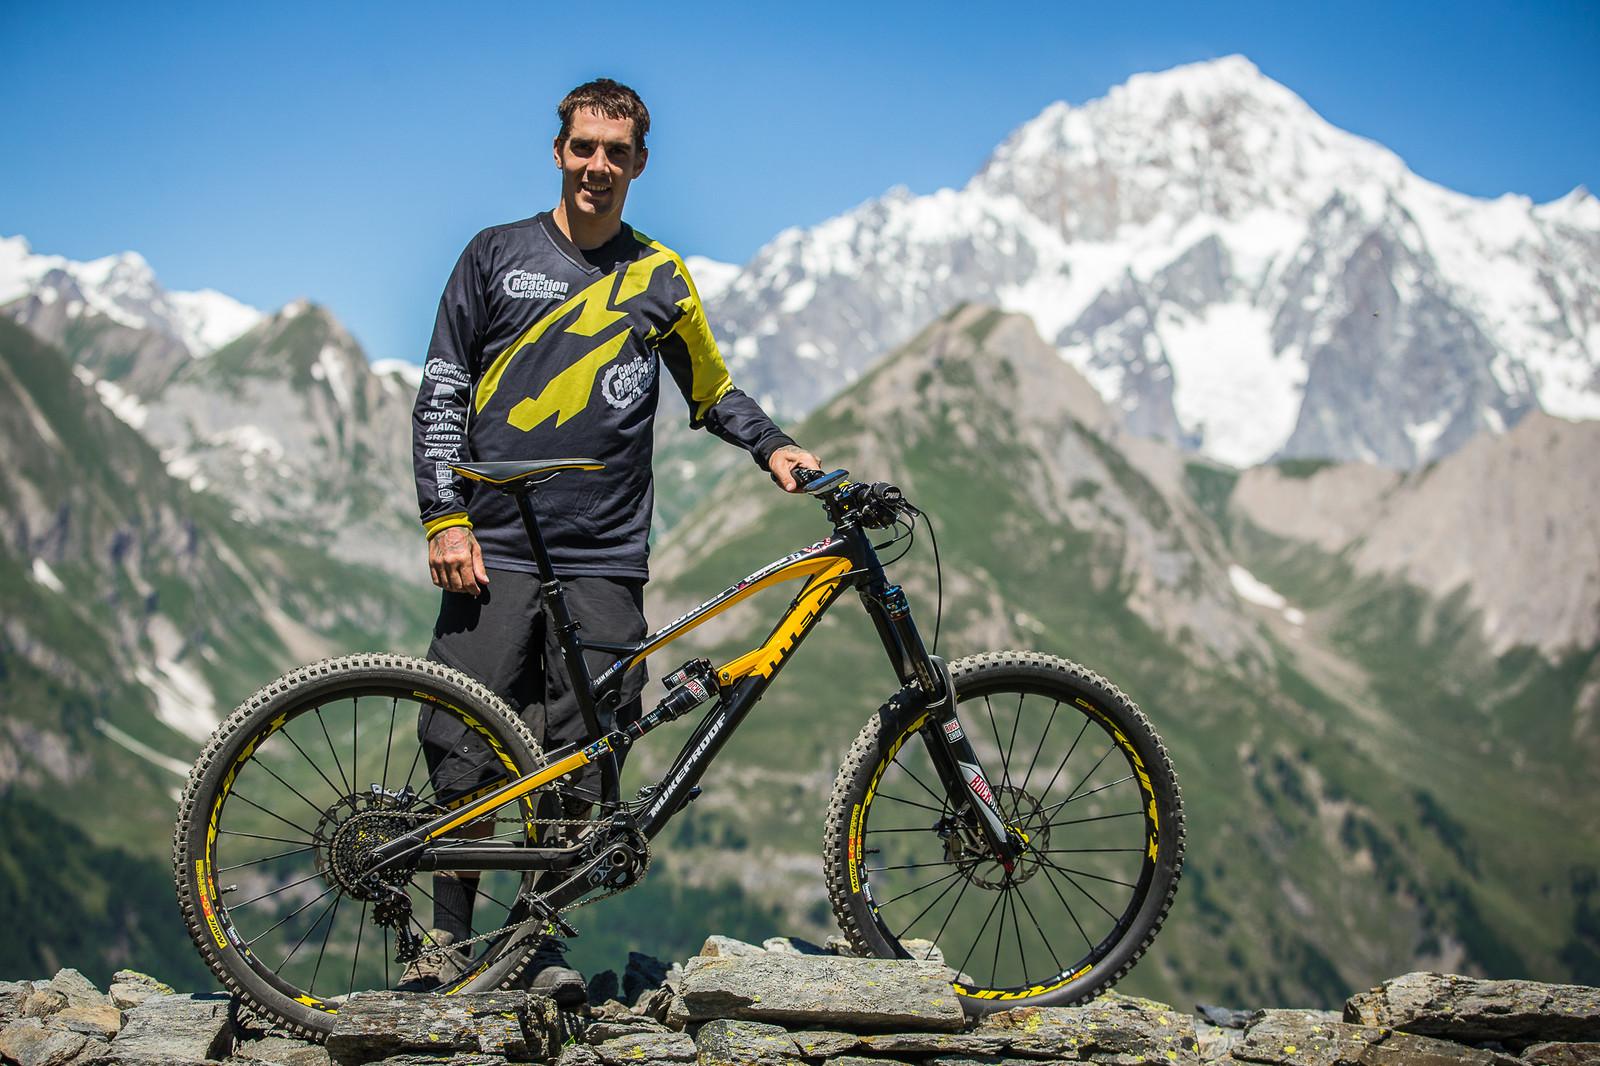 Sam Hill, Bitches - PIT BITS - Enduro World Series, La Thuile, Italy - Mountain Biking Pictures - Vital MTB